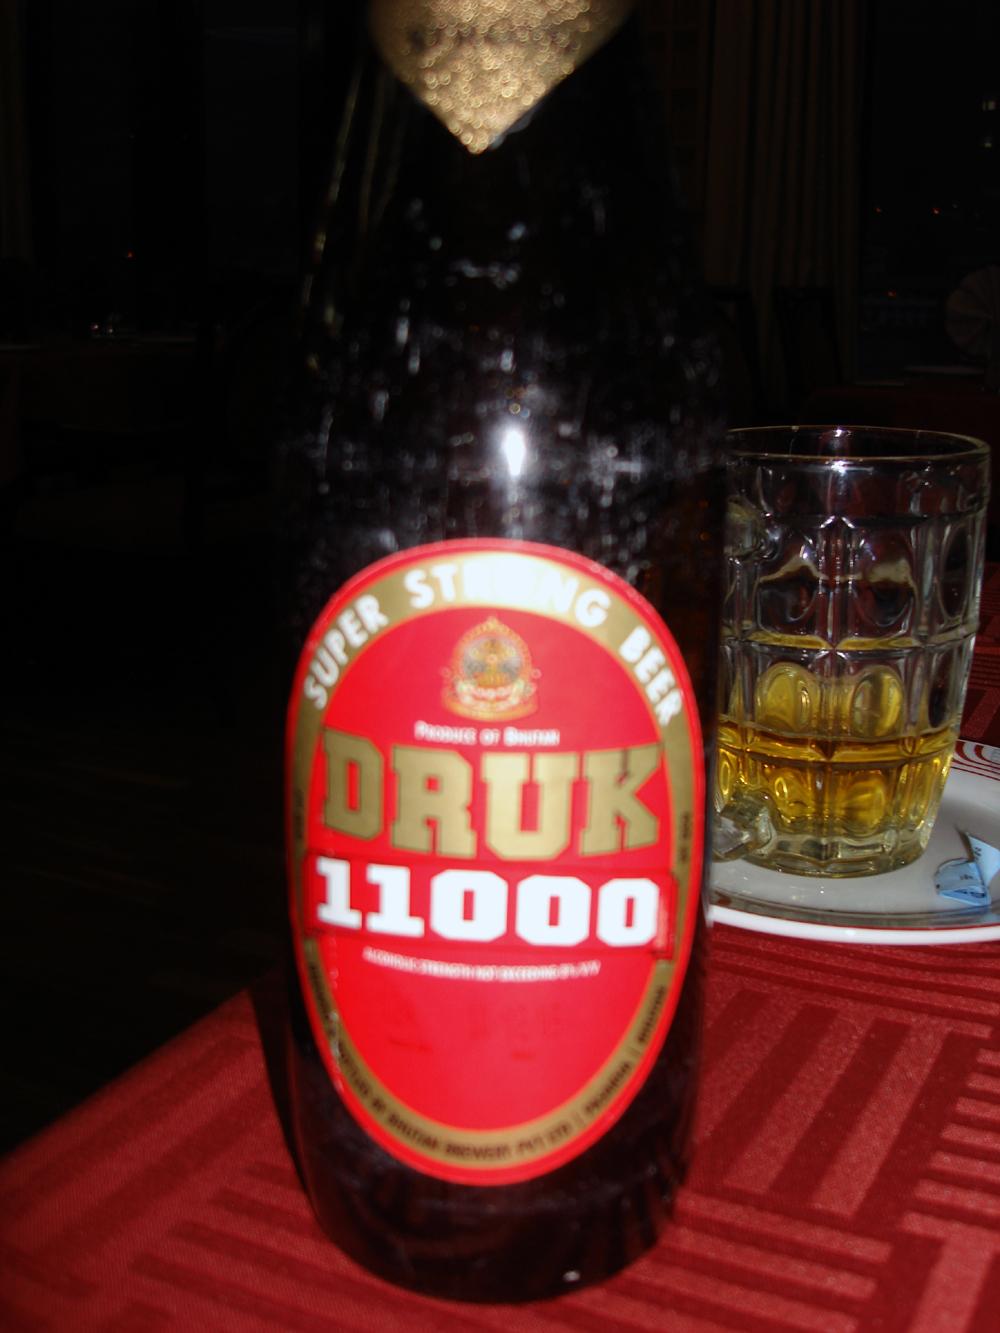 Bhutan Bier Druk 11000 Michael Polster